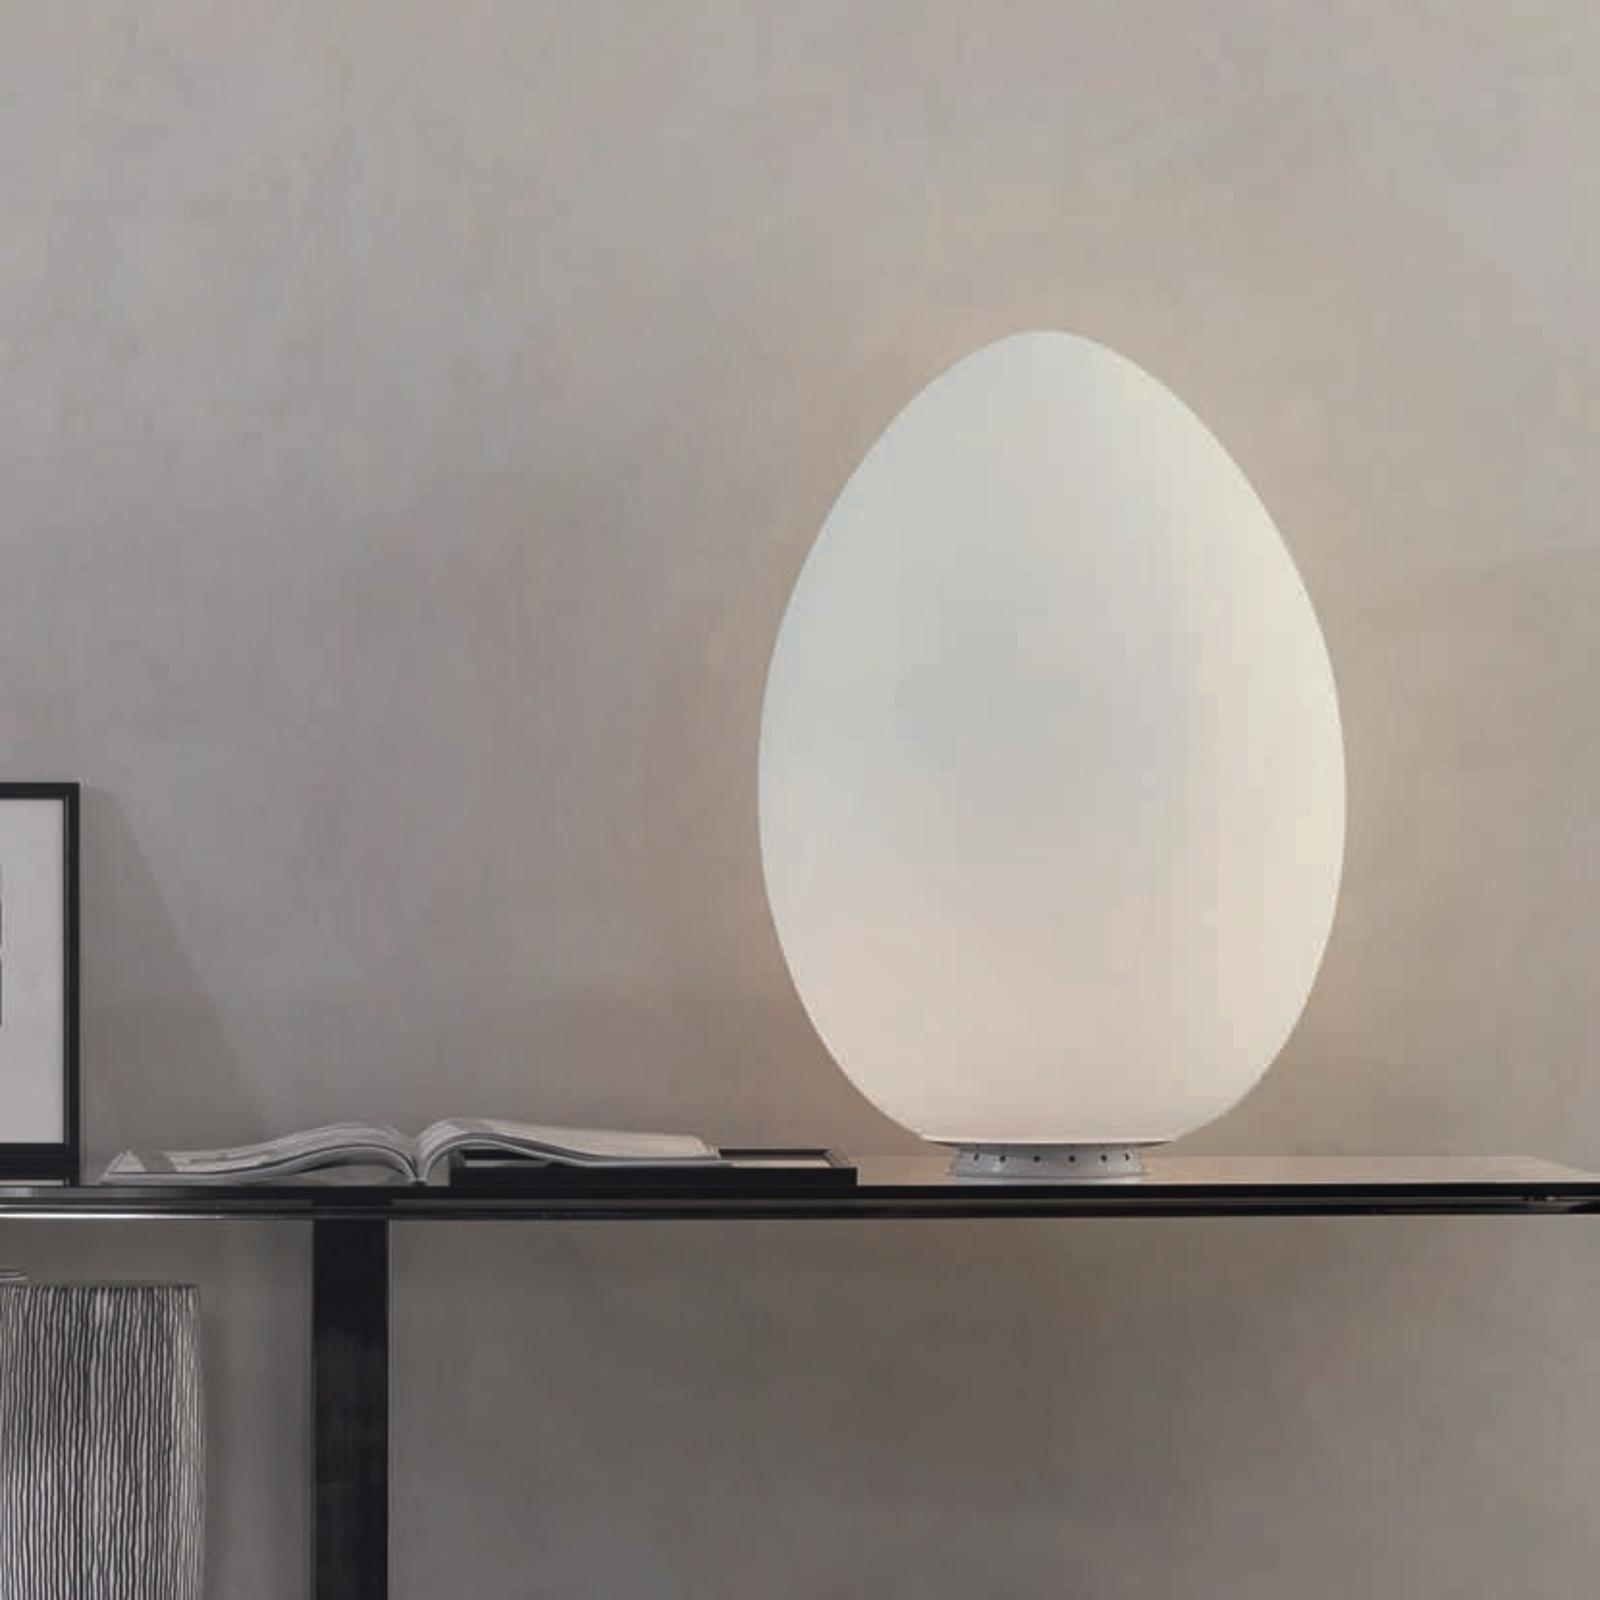 Bijzonder mooie tafellamp UOVO, 27 cm